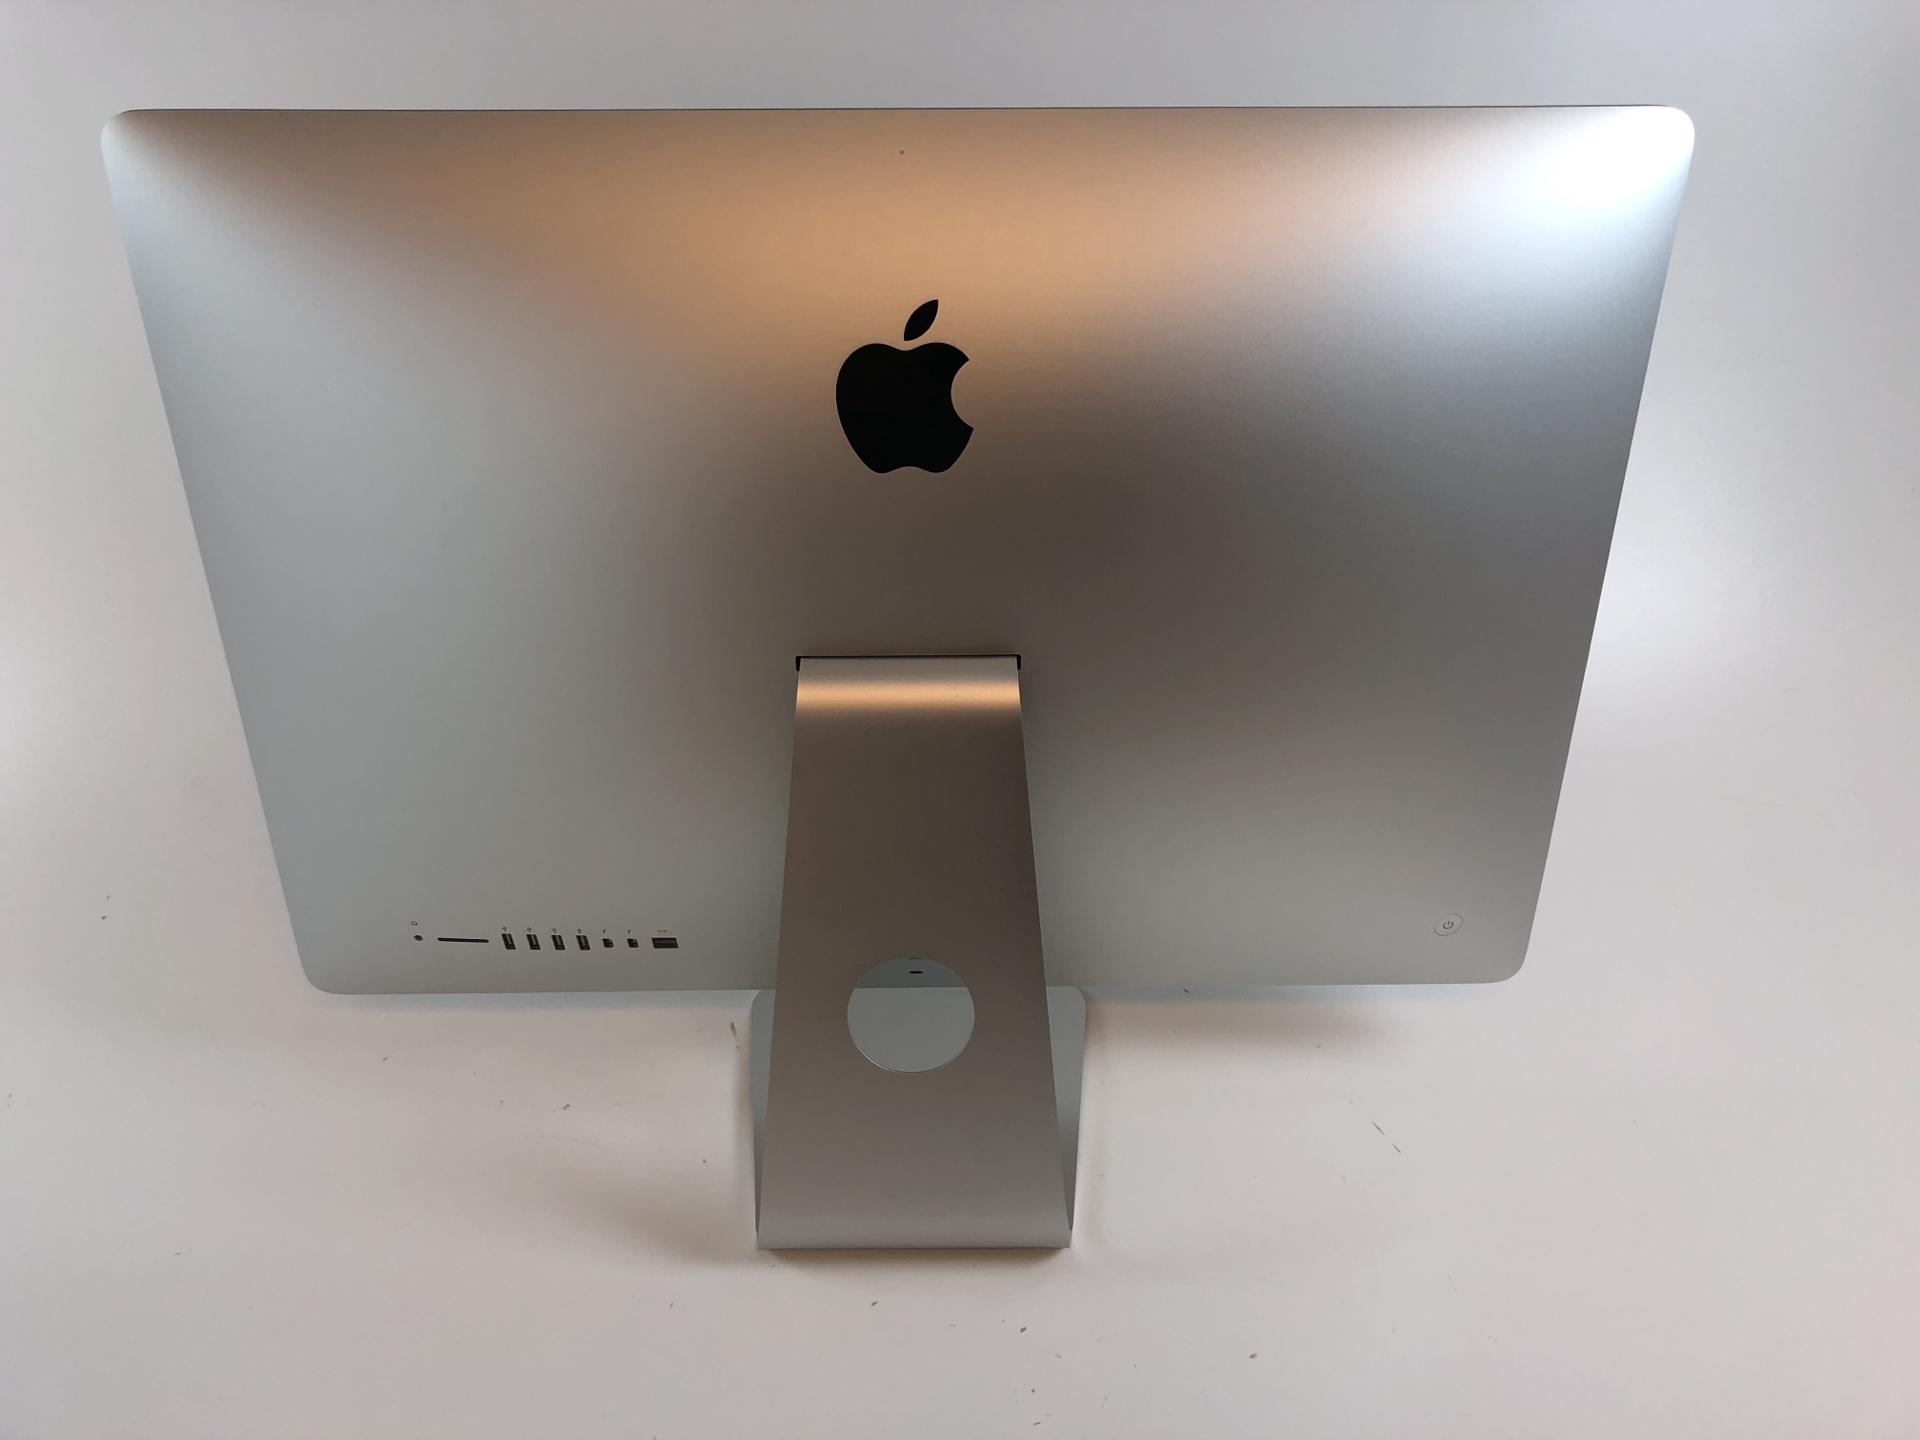 "iMac 27"" Late 2013 (Intel Quad-Core i7 3.5 GHz 32 GB RAM 1 TB Fusion Drive), Intel Quad-Core i7 3.5 GHz, 32 GB RAM, 1 TB Fusion Drive, Kuva 2"